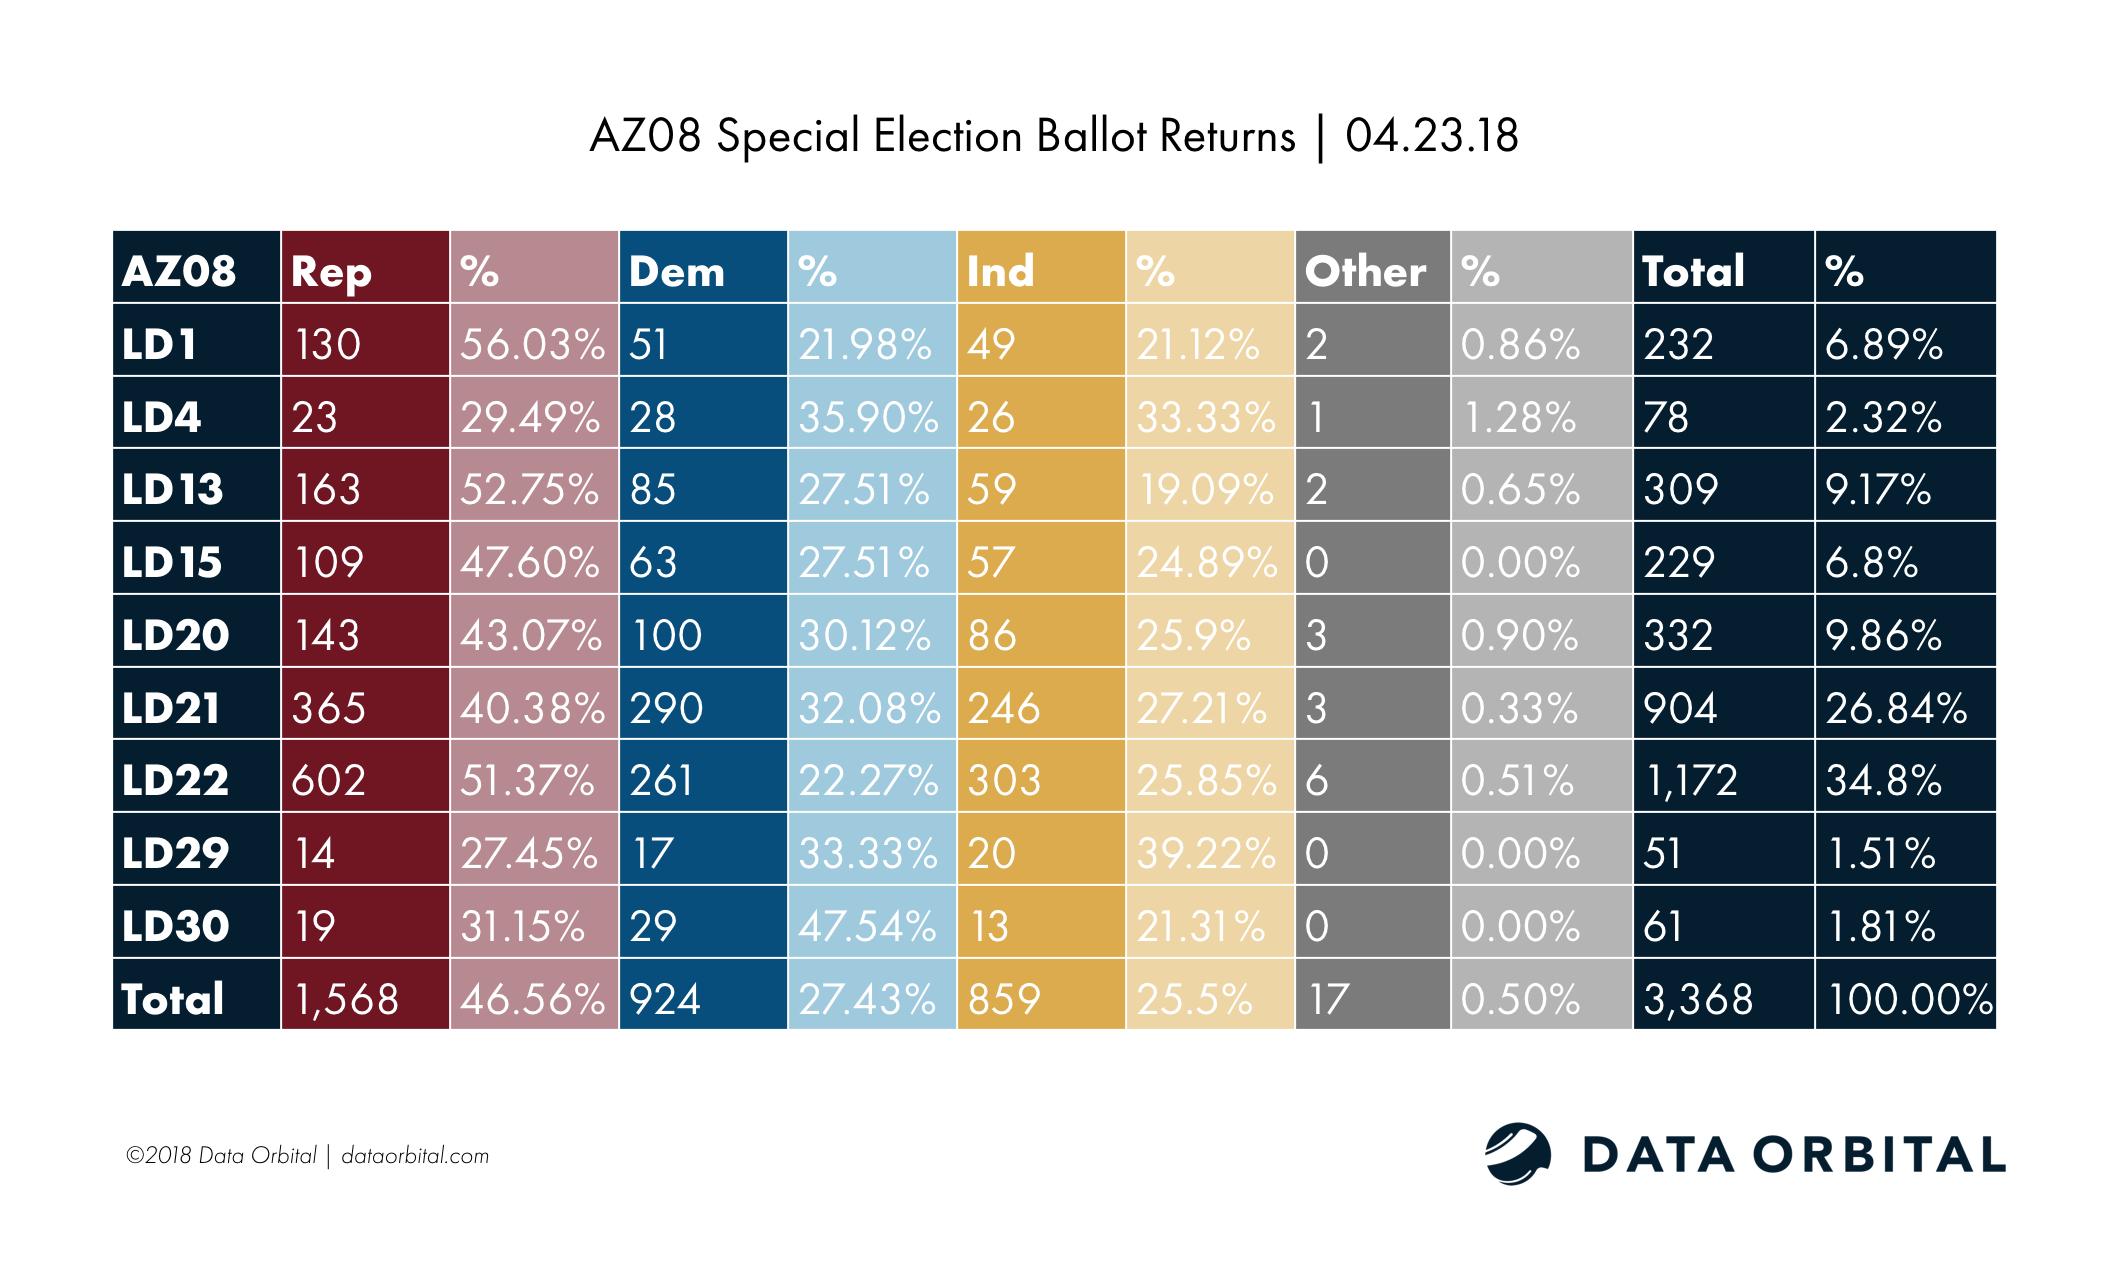 AZ08 Special Election Ballot Returns 04.23.18